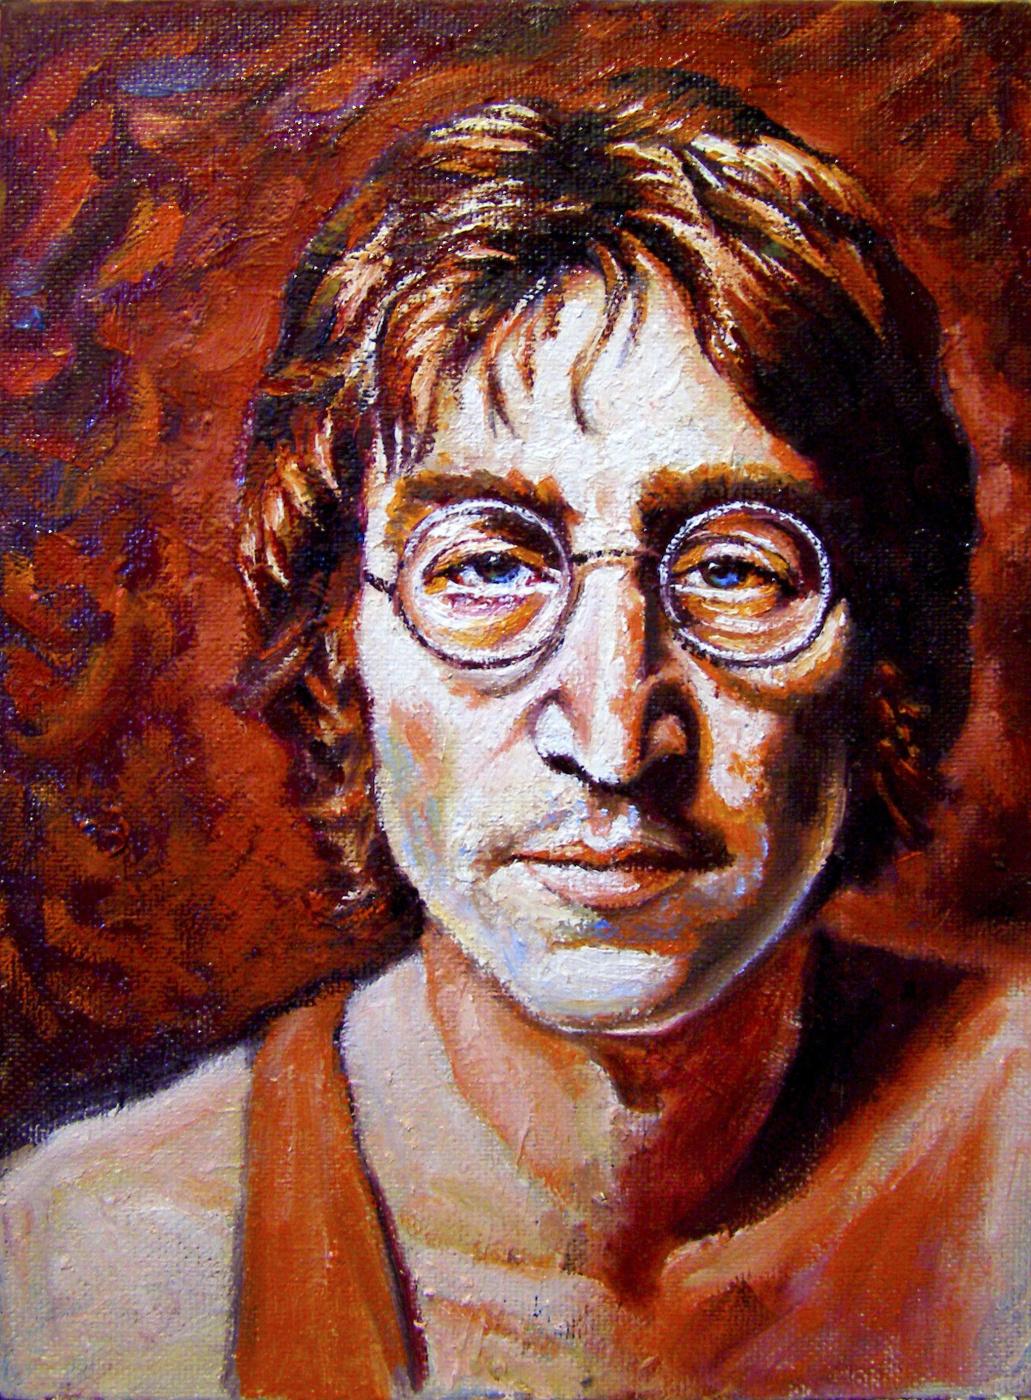 Gaisa Rsalievich Ziangirov. John Lennon